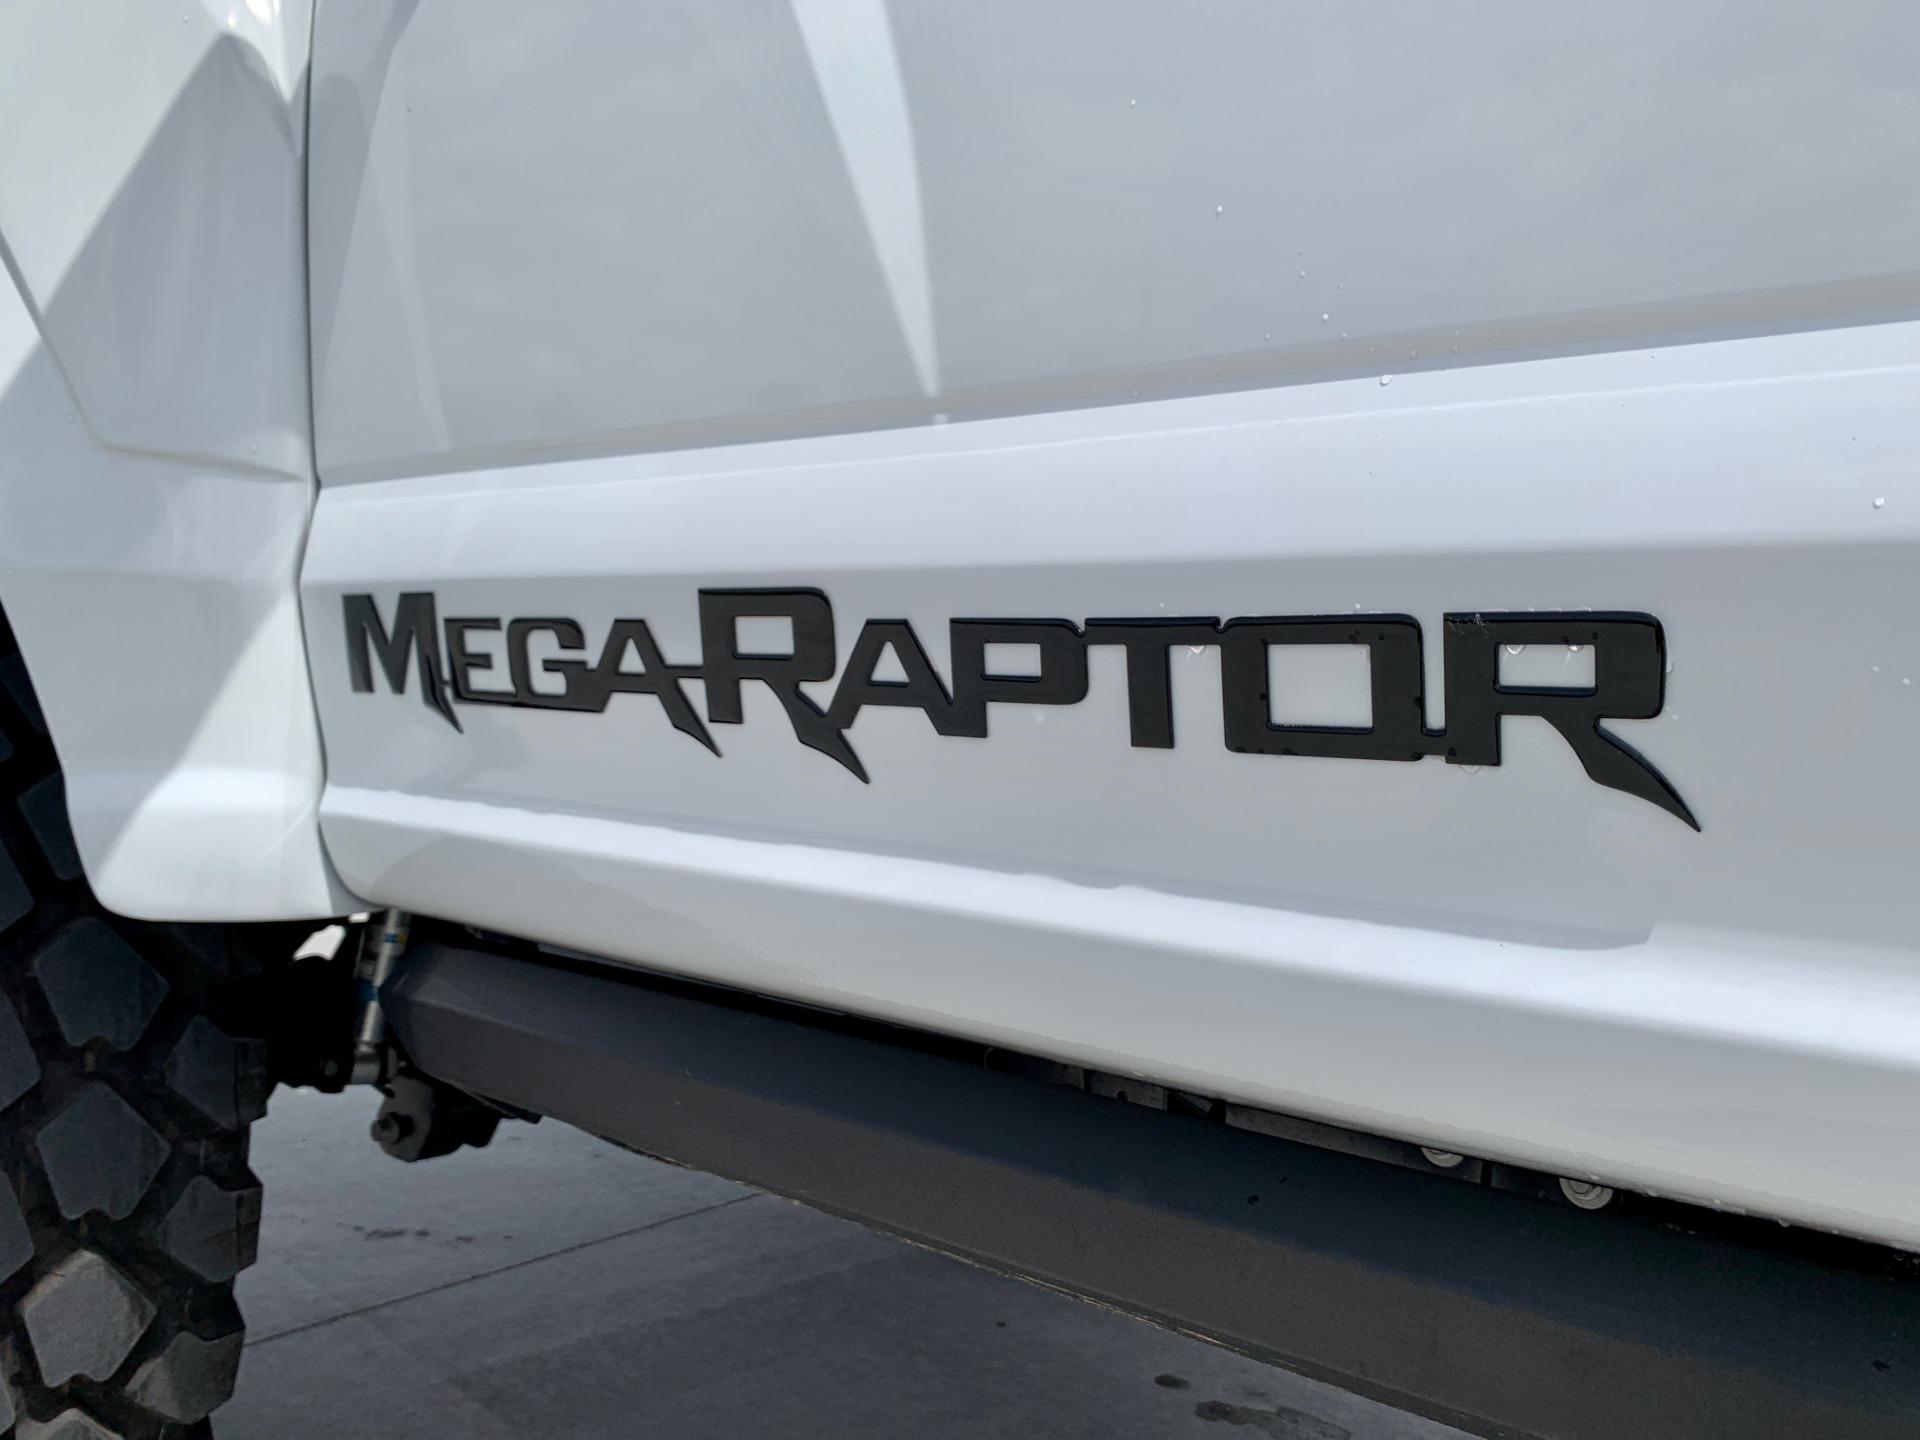 Used-2019-Ford-F350-Super-Duty-Lariat-Ultimate-Mega-Raptor-4x4